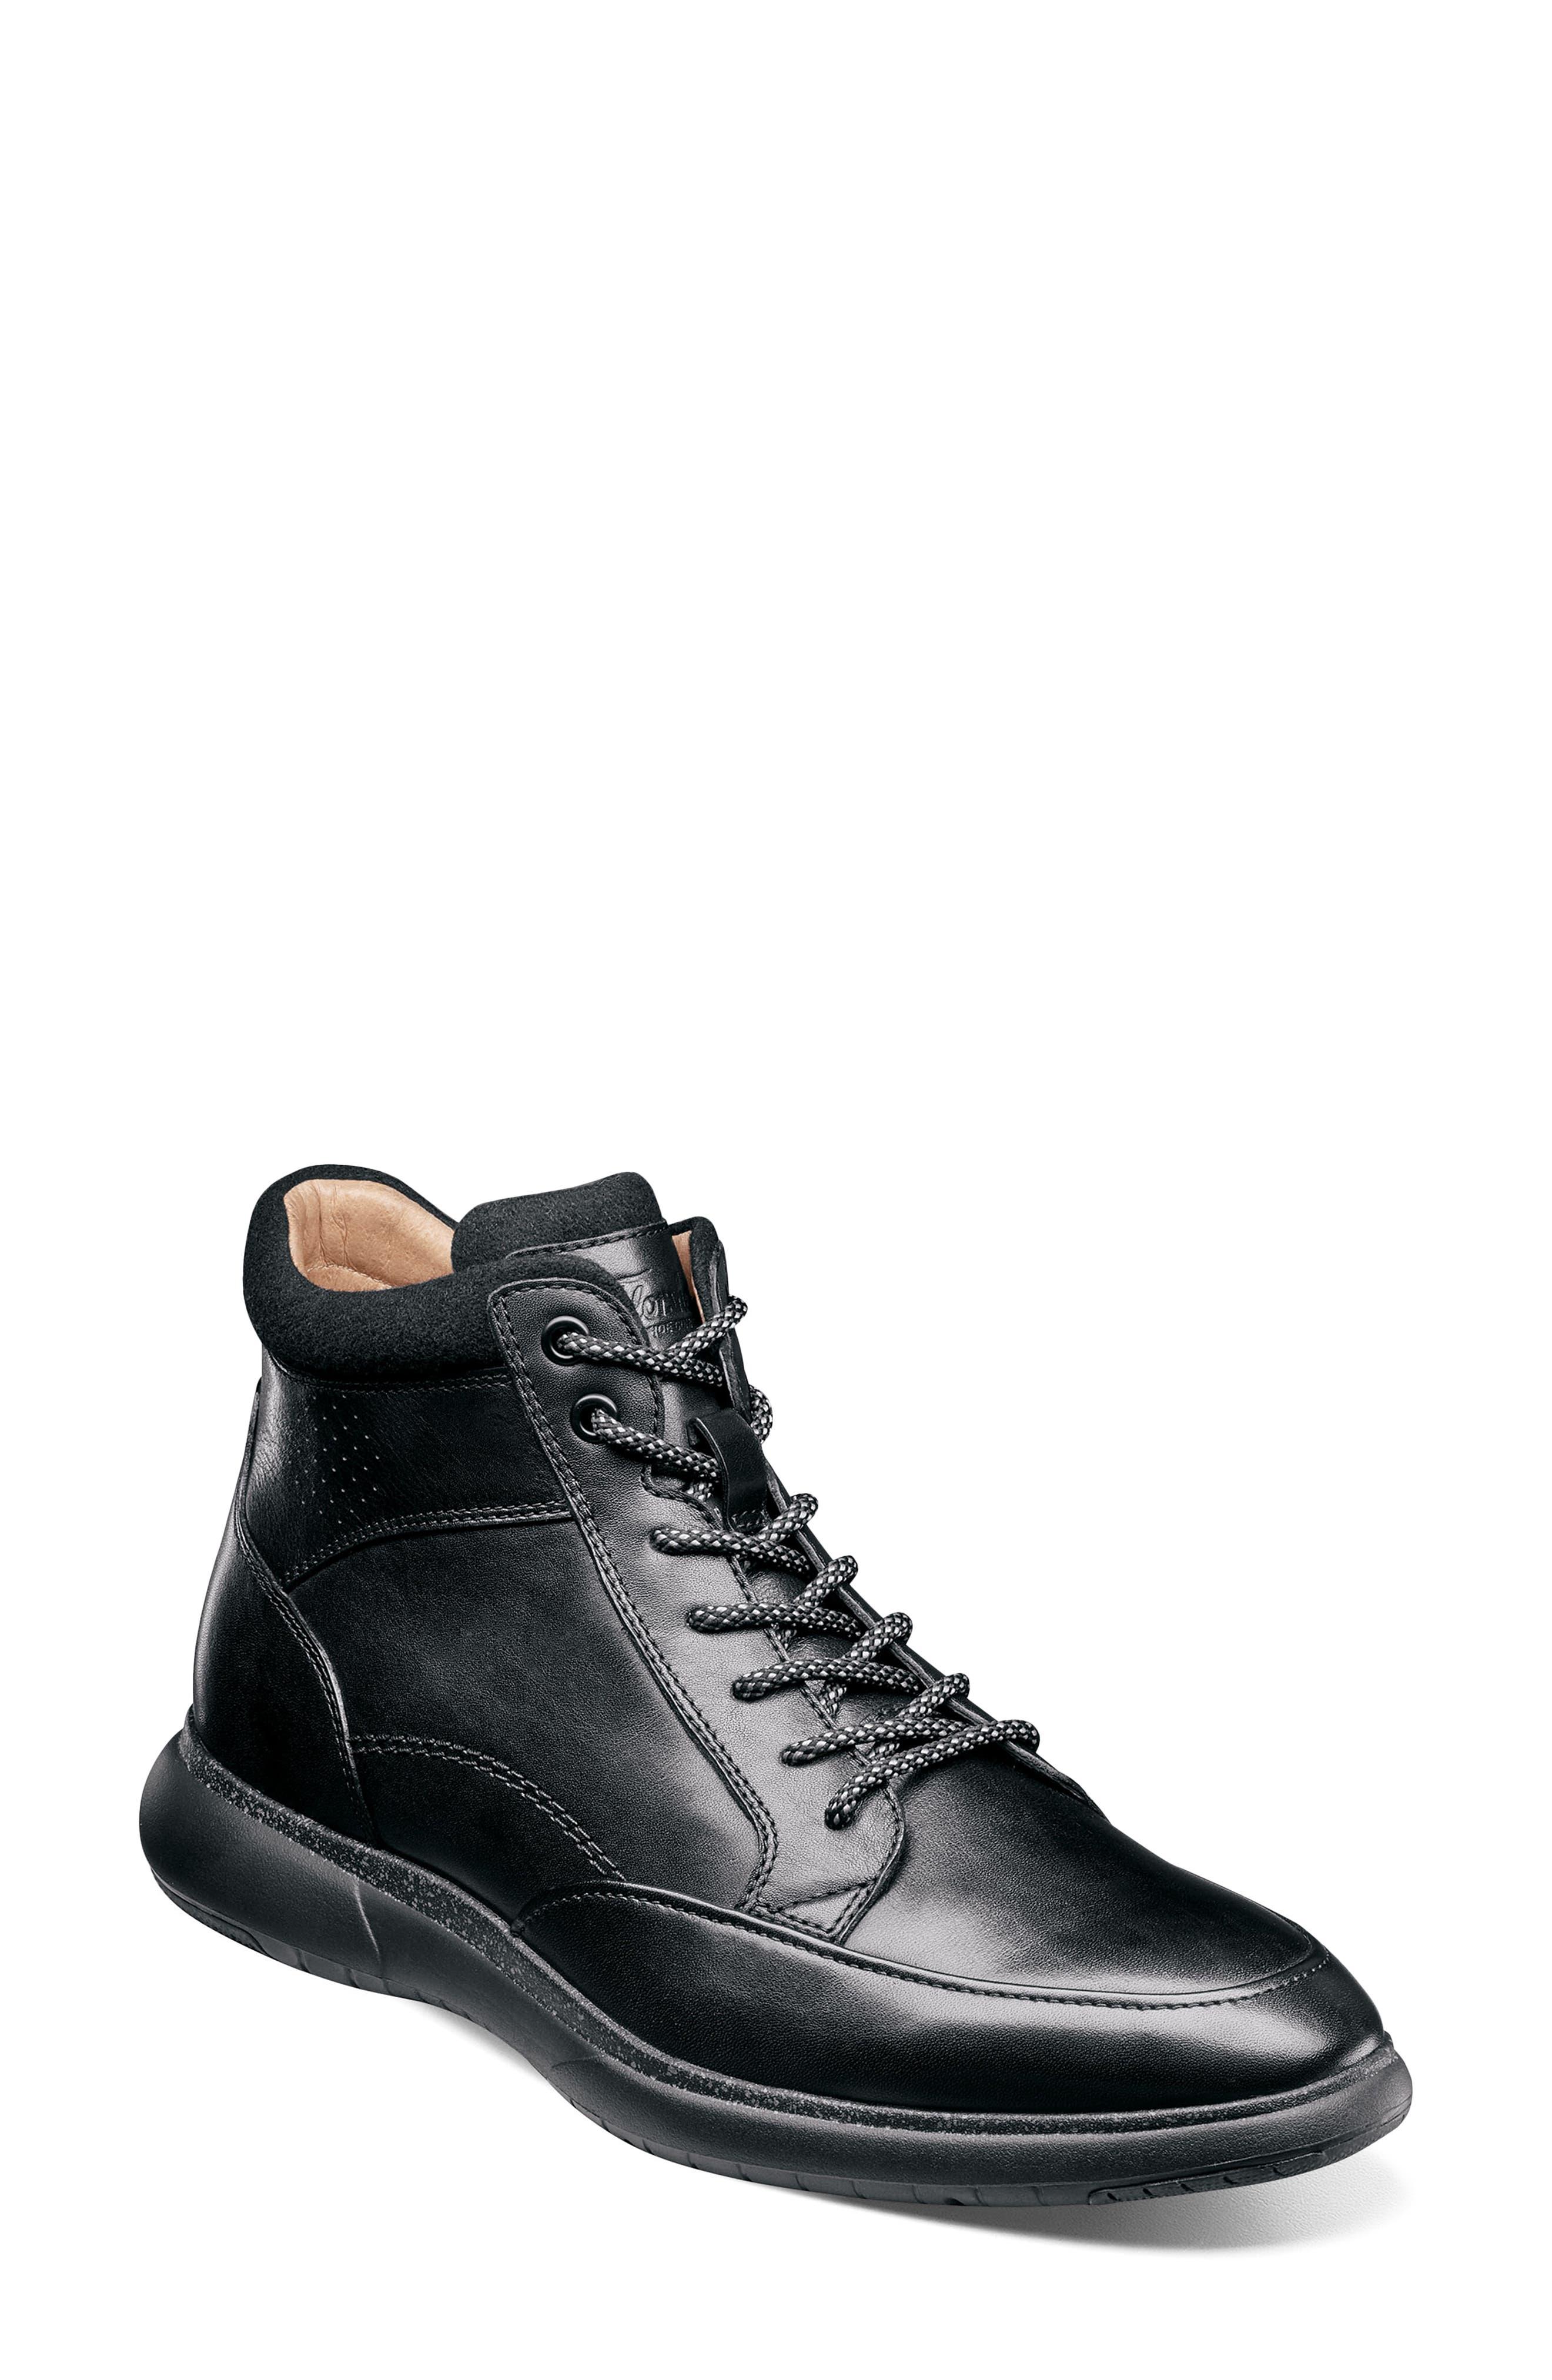 Flair Moc Toe Boot